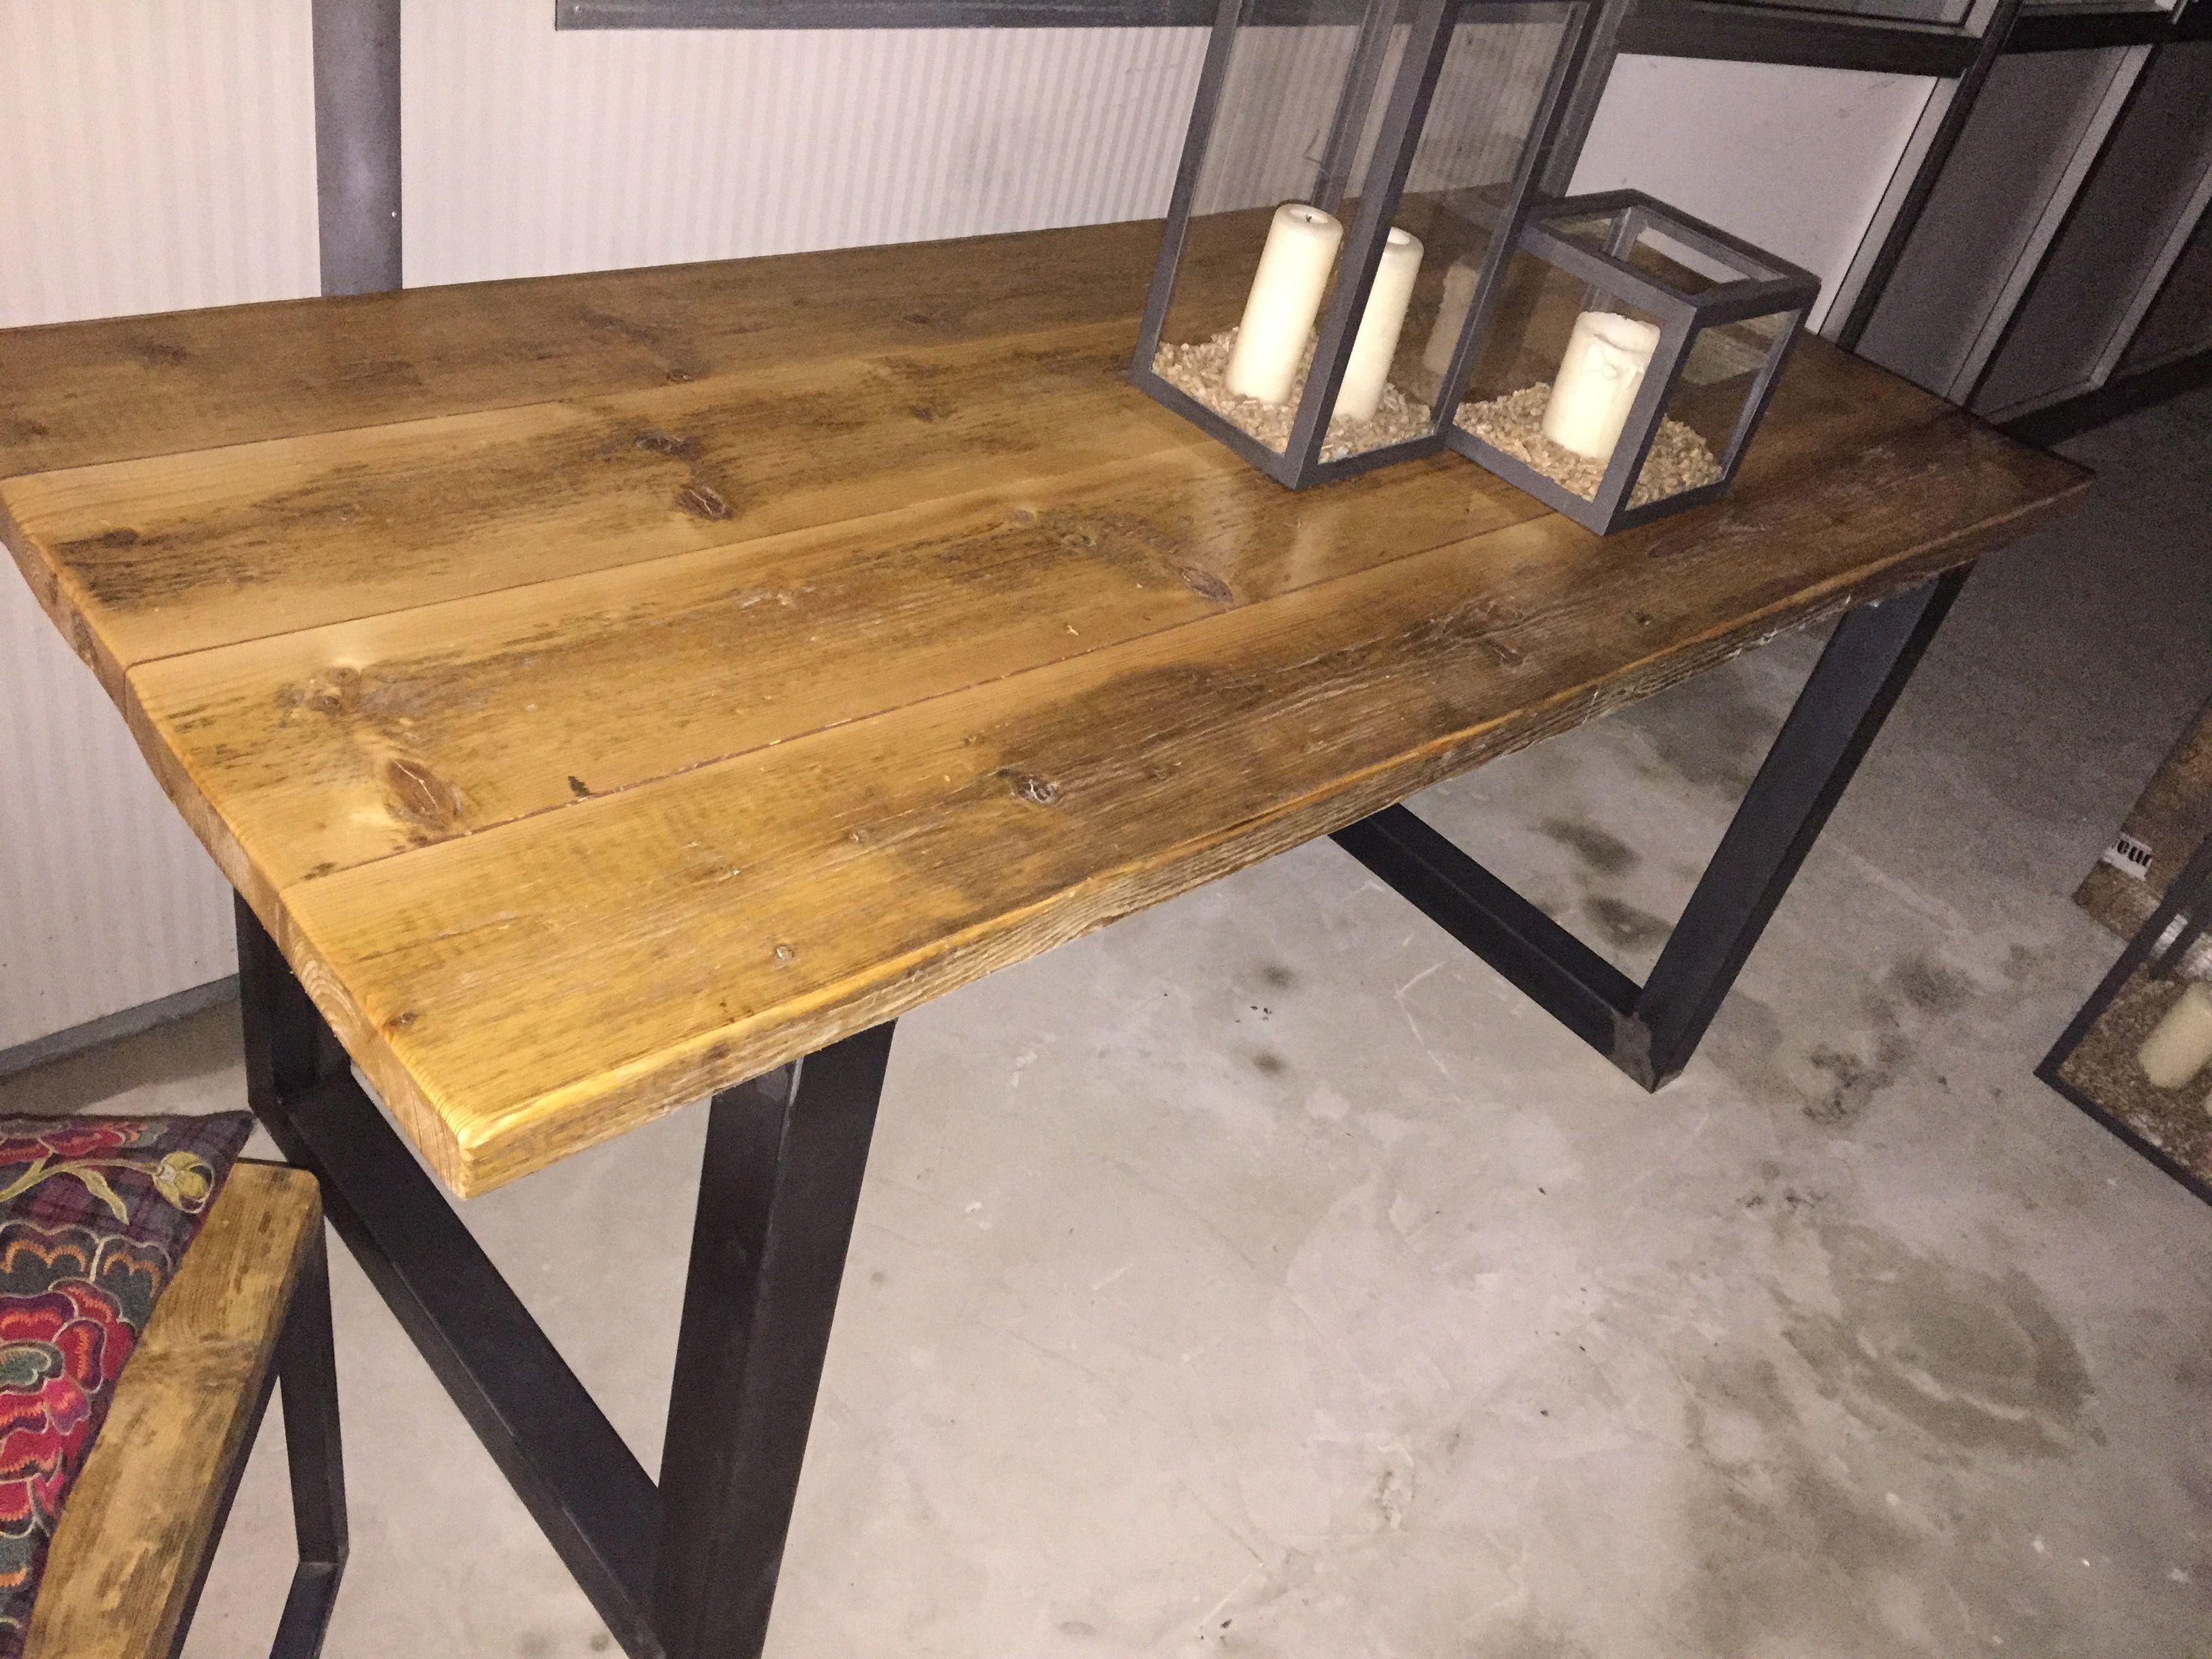 Table Ou Bureau De Fabrication Artisanale Style Industriel